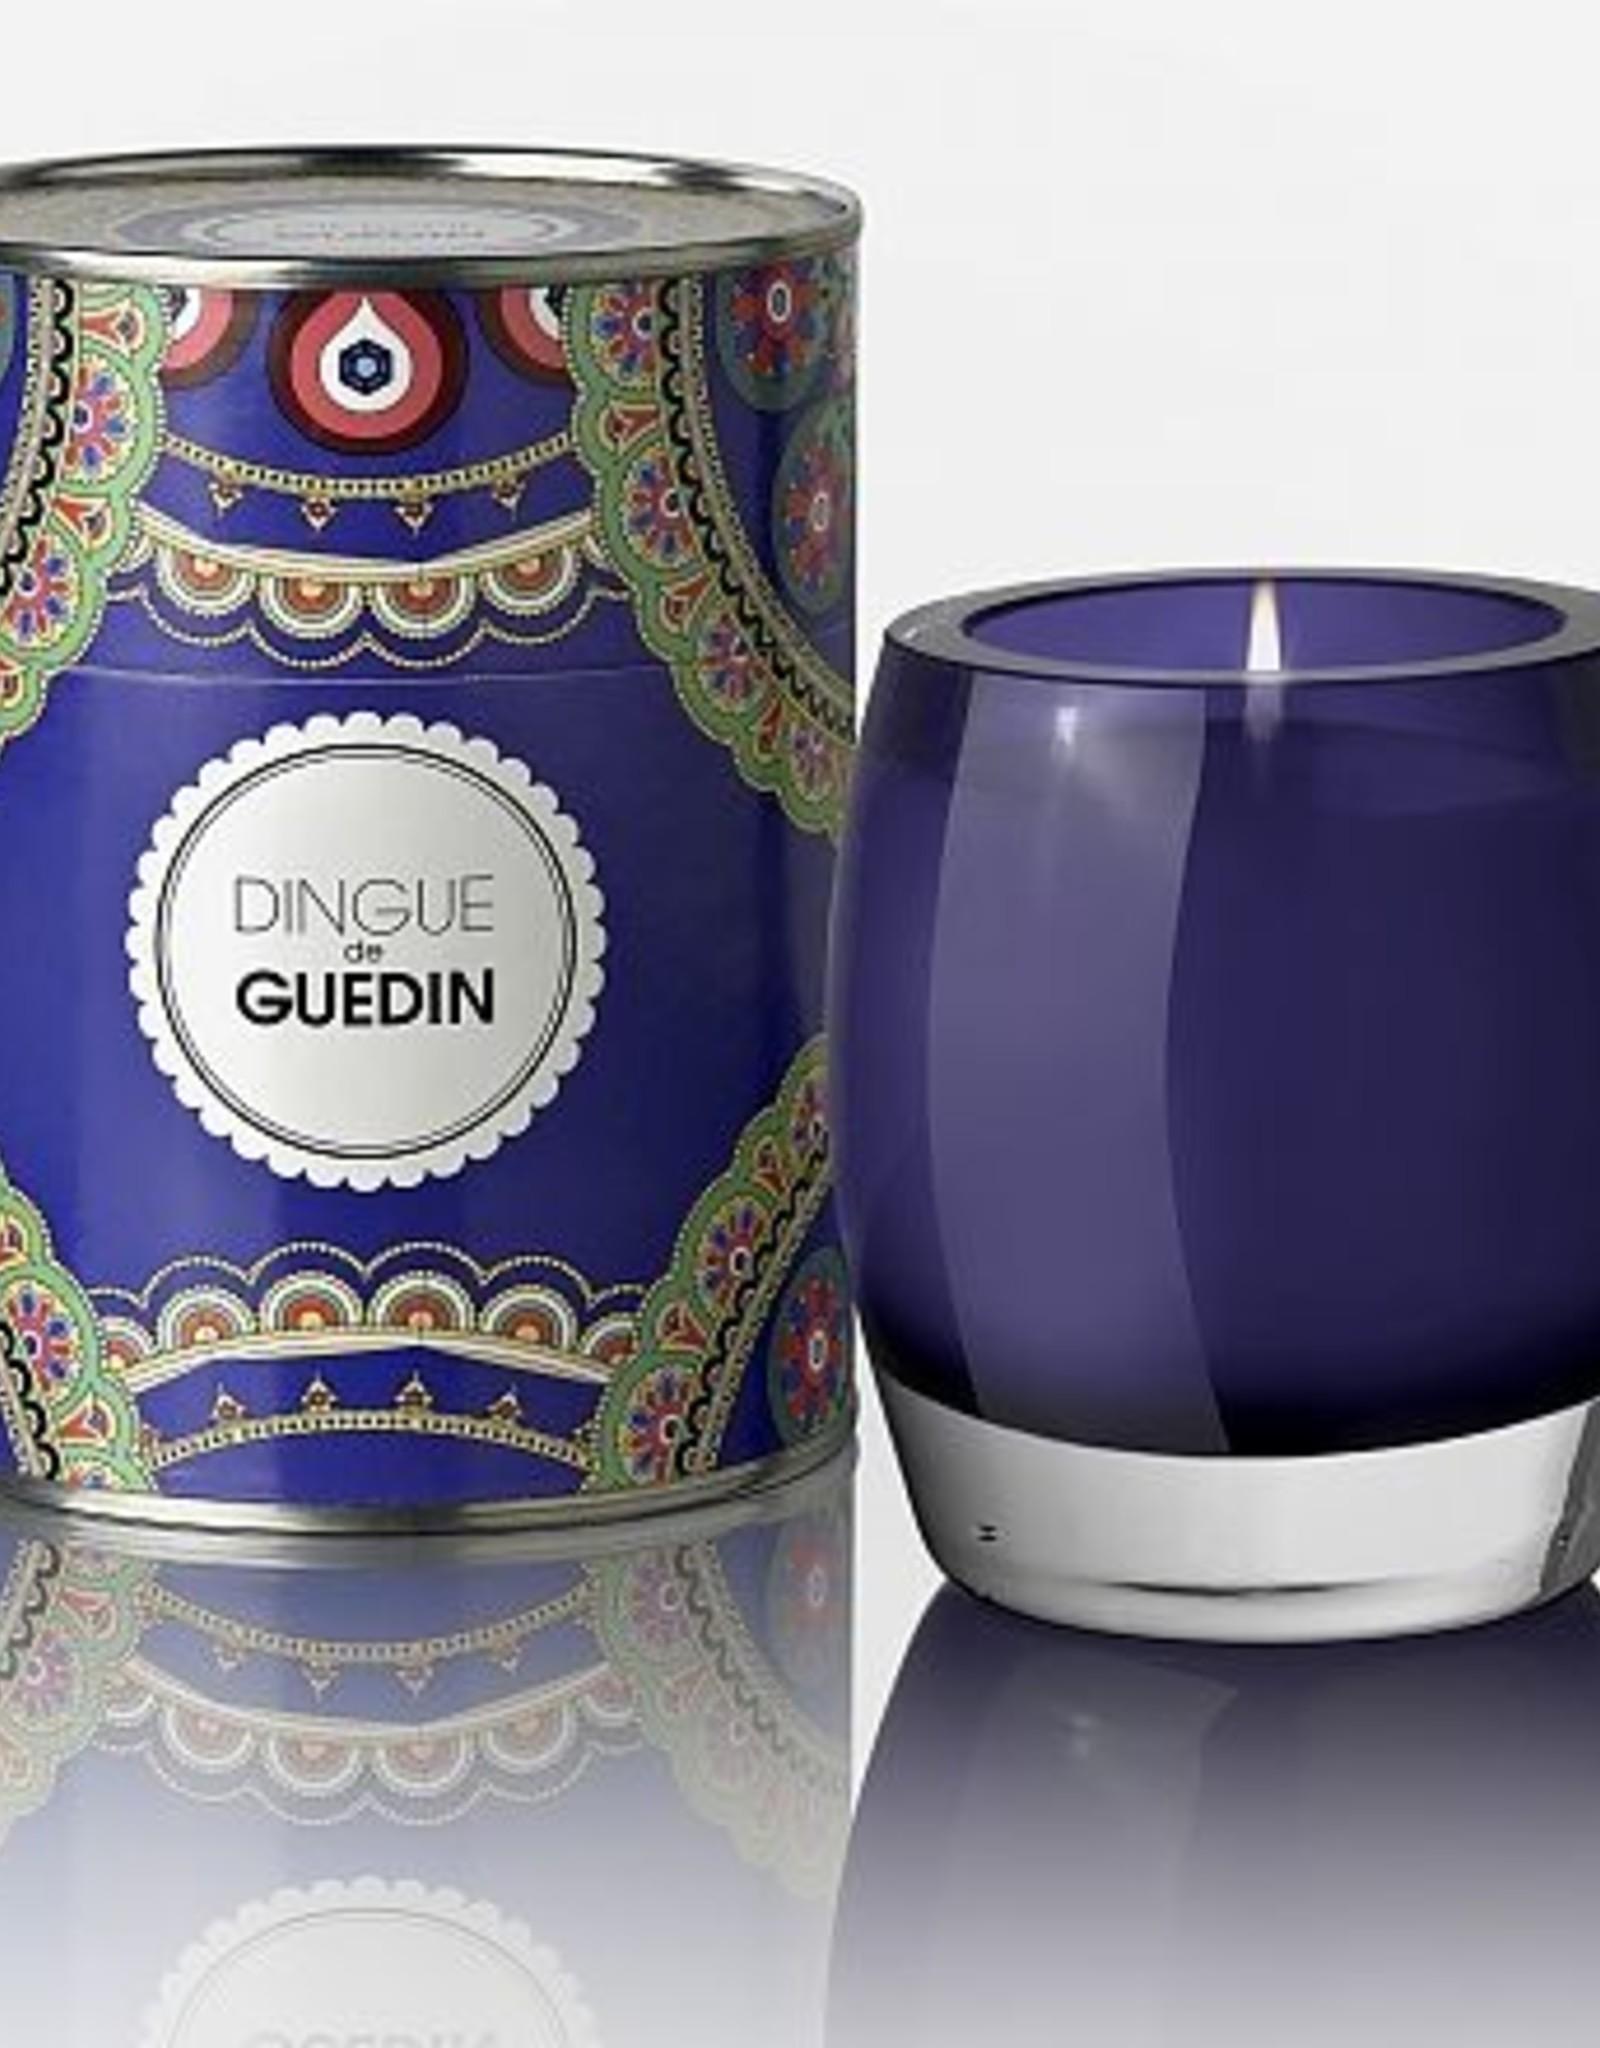 Marianne Guedin Dingue De Guedin